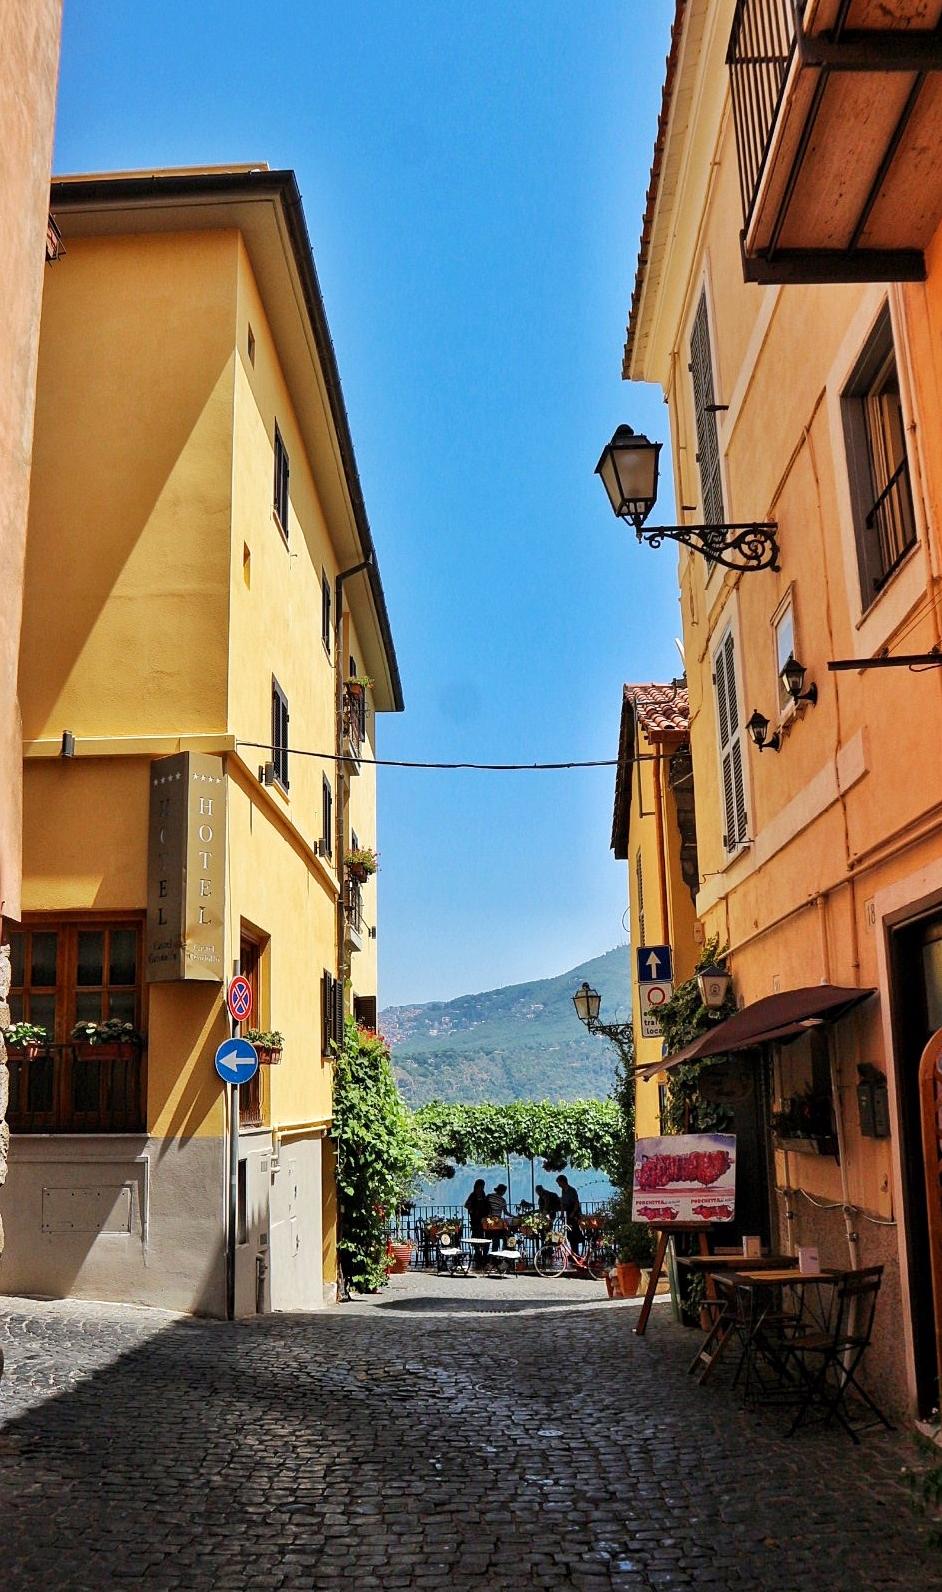 Italy ~ Castel Gandolfo